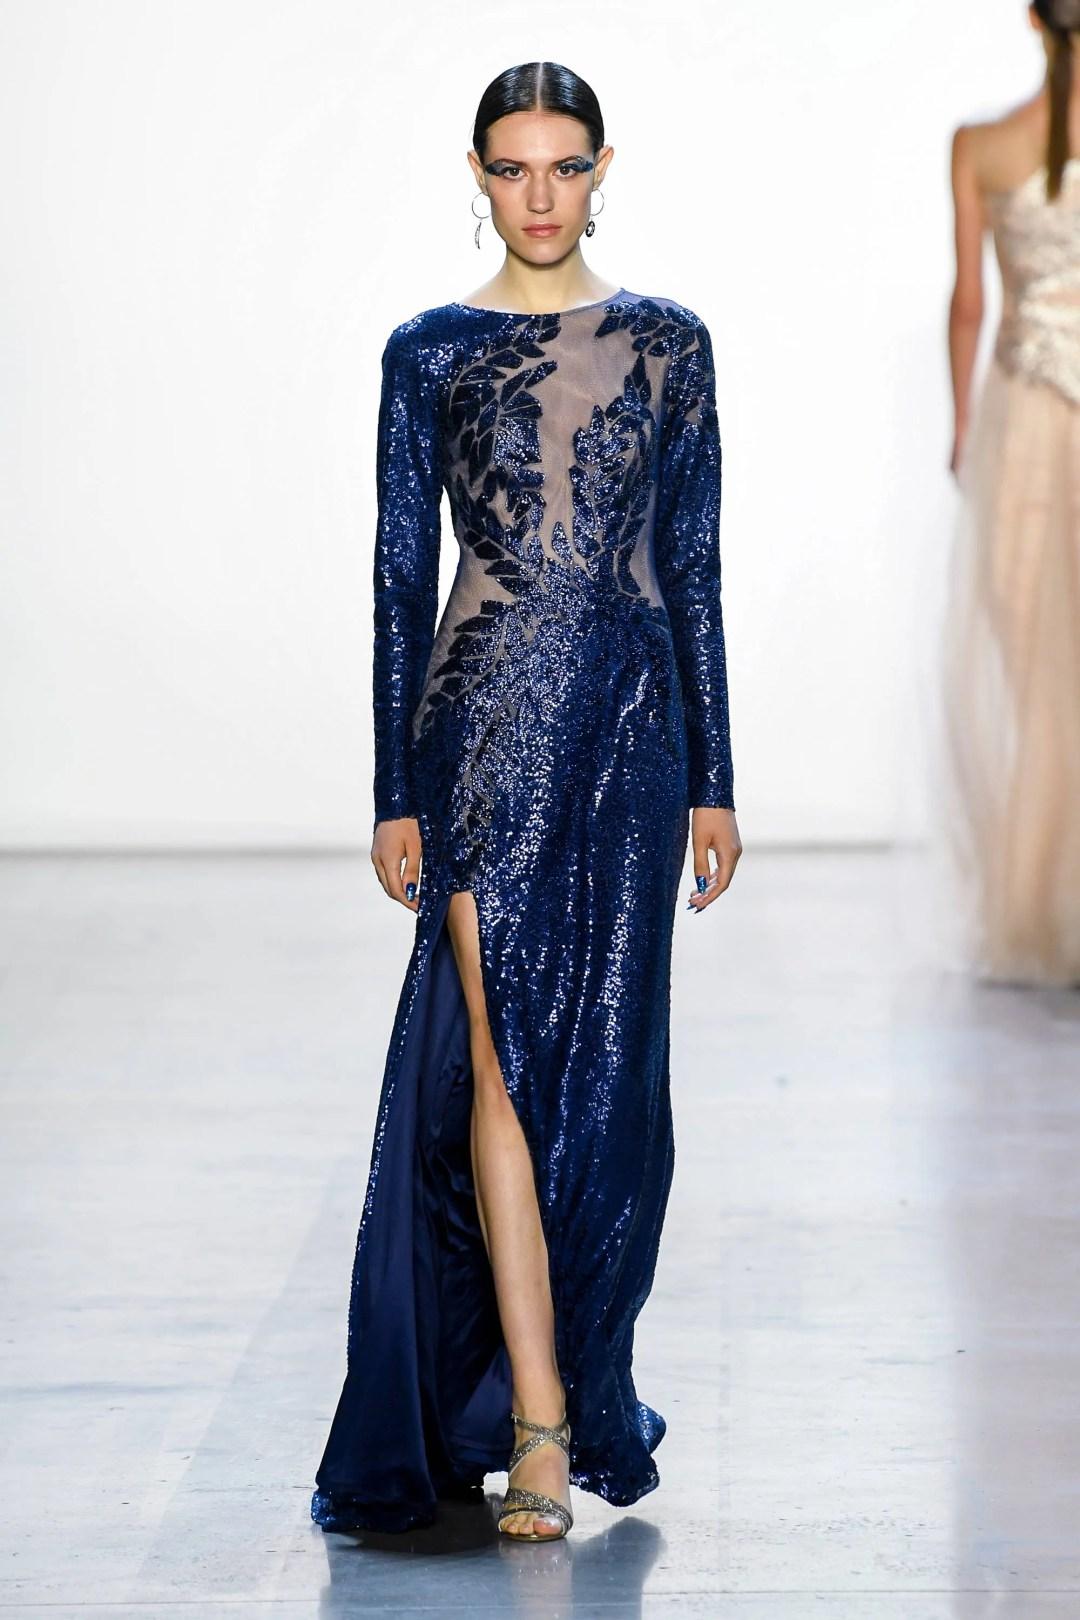 Blog Fashion Week Andrew Smith Abstract Linen Shirt Navy Xxl Tadashi Shoji